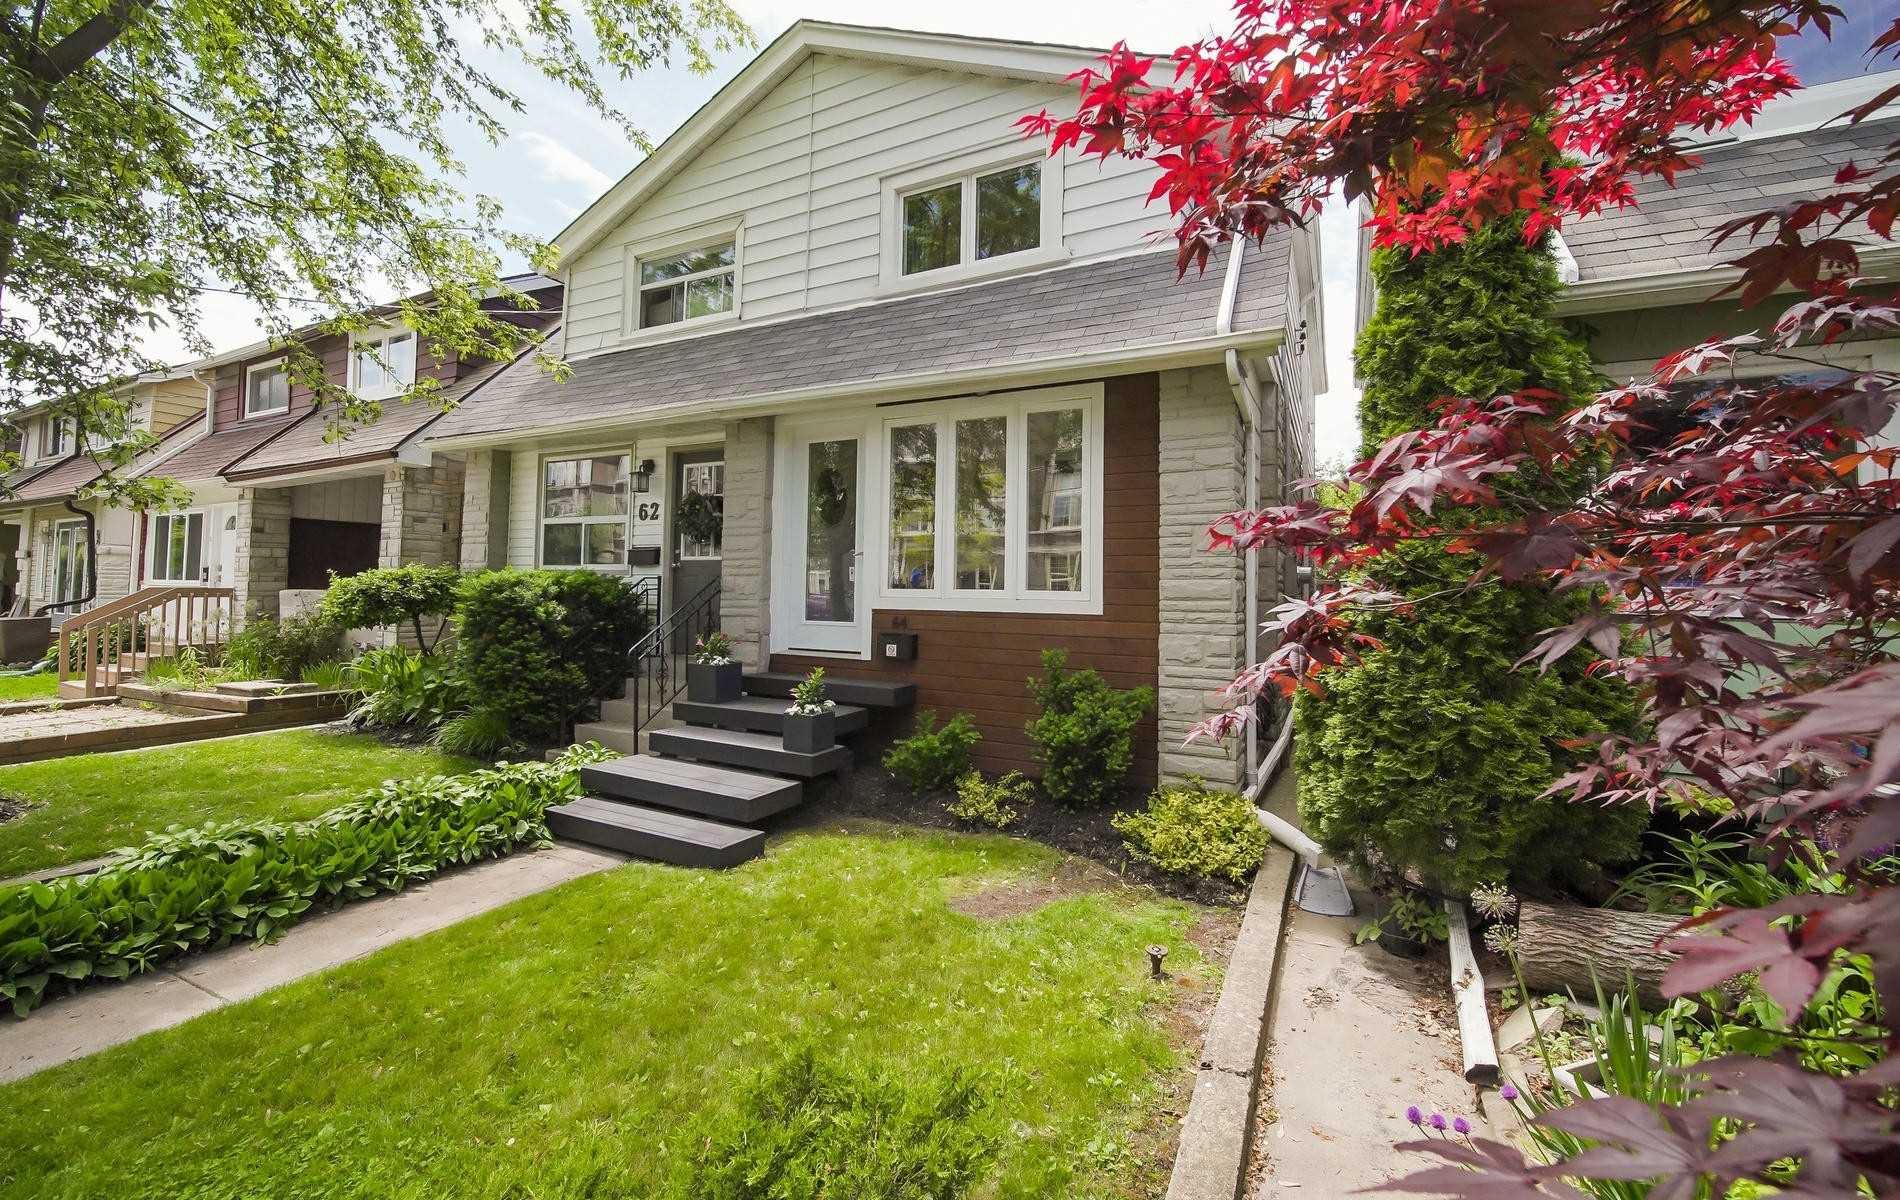 Main Photo: 64 Larchmount Avenue in Toronto: South Riverdale House (2-Storey) for sale (Toronto E01)  : MLS®# E4489752